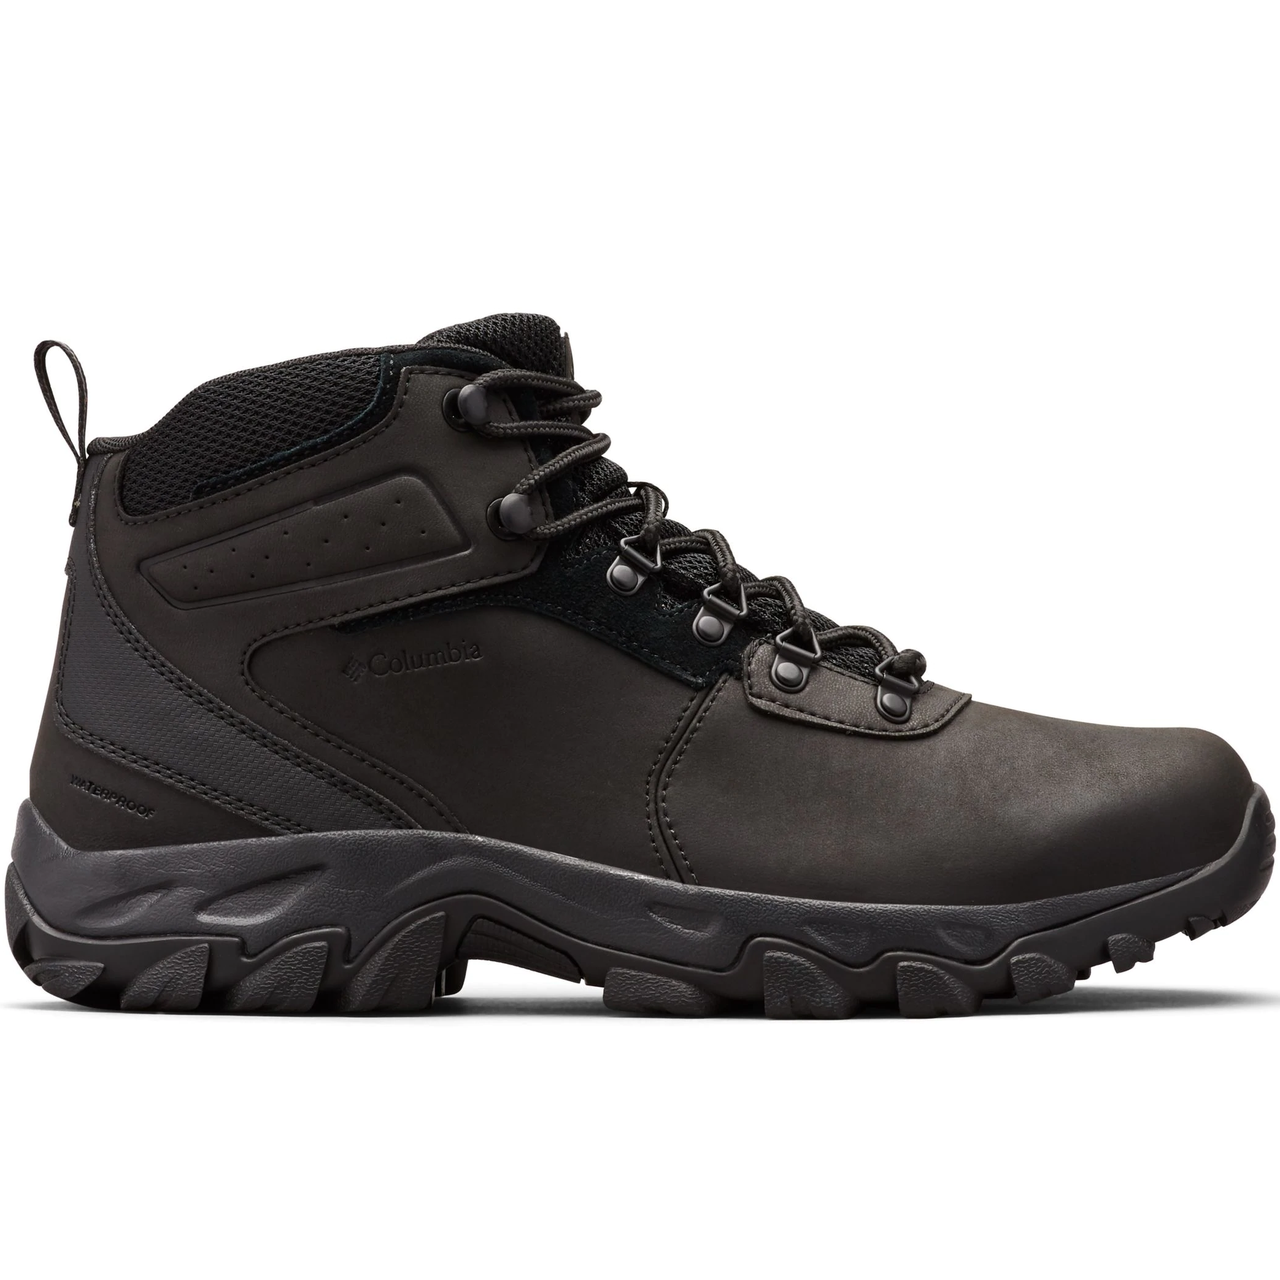 Мужские ботинки Columbia Newton Ridge Plus II Waterproof